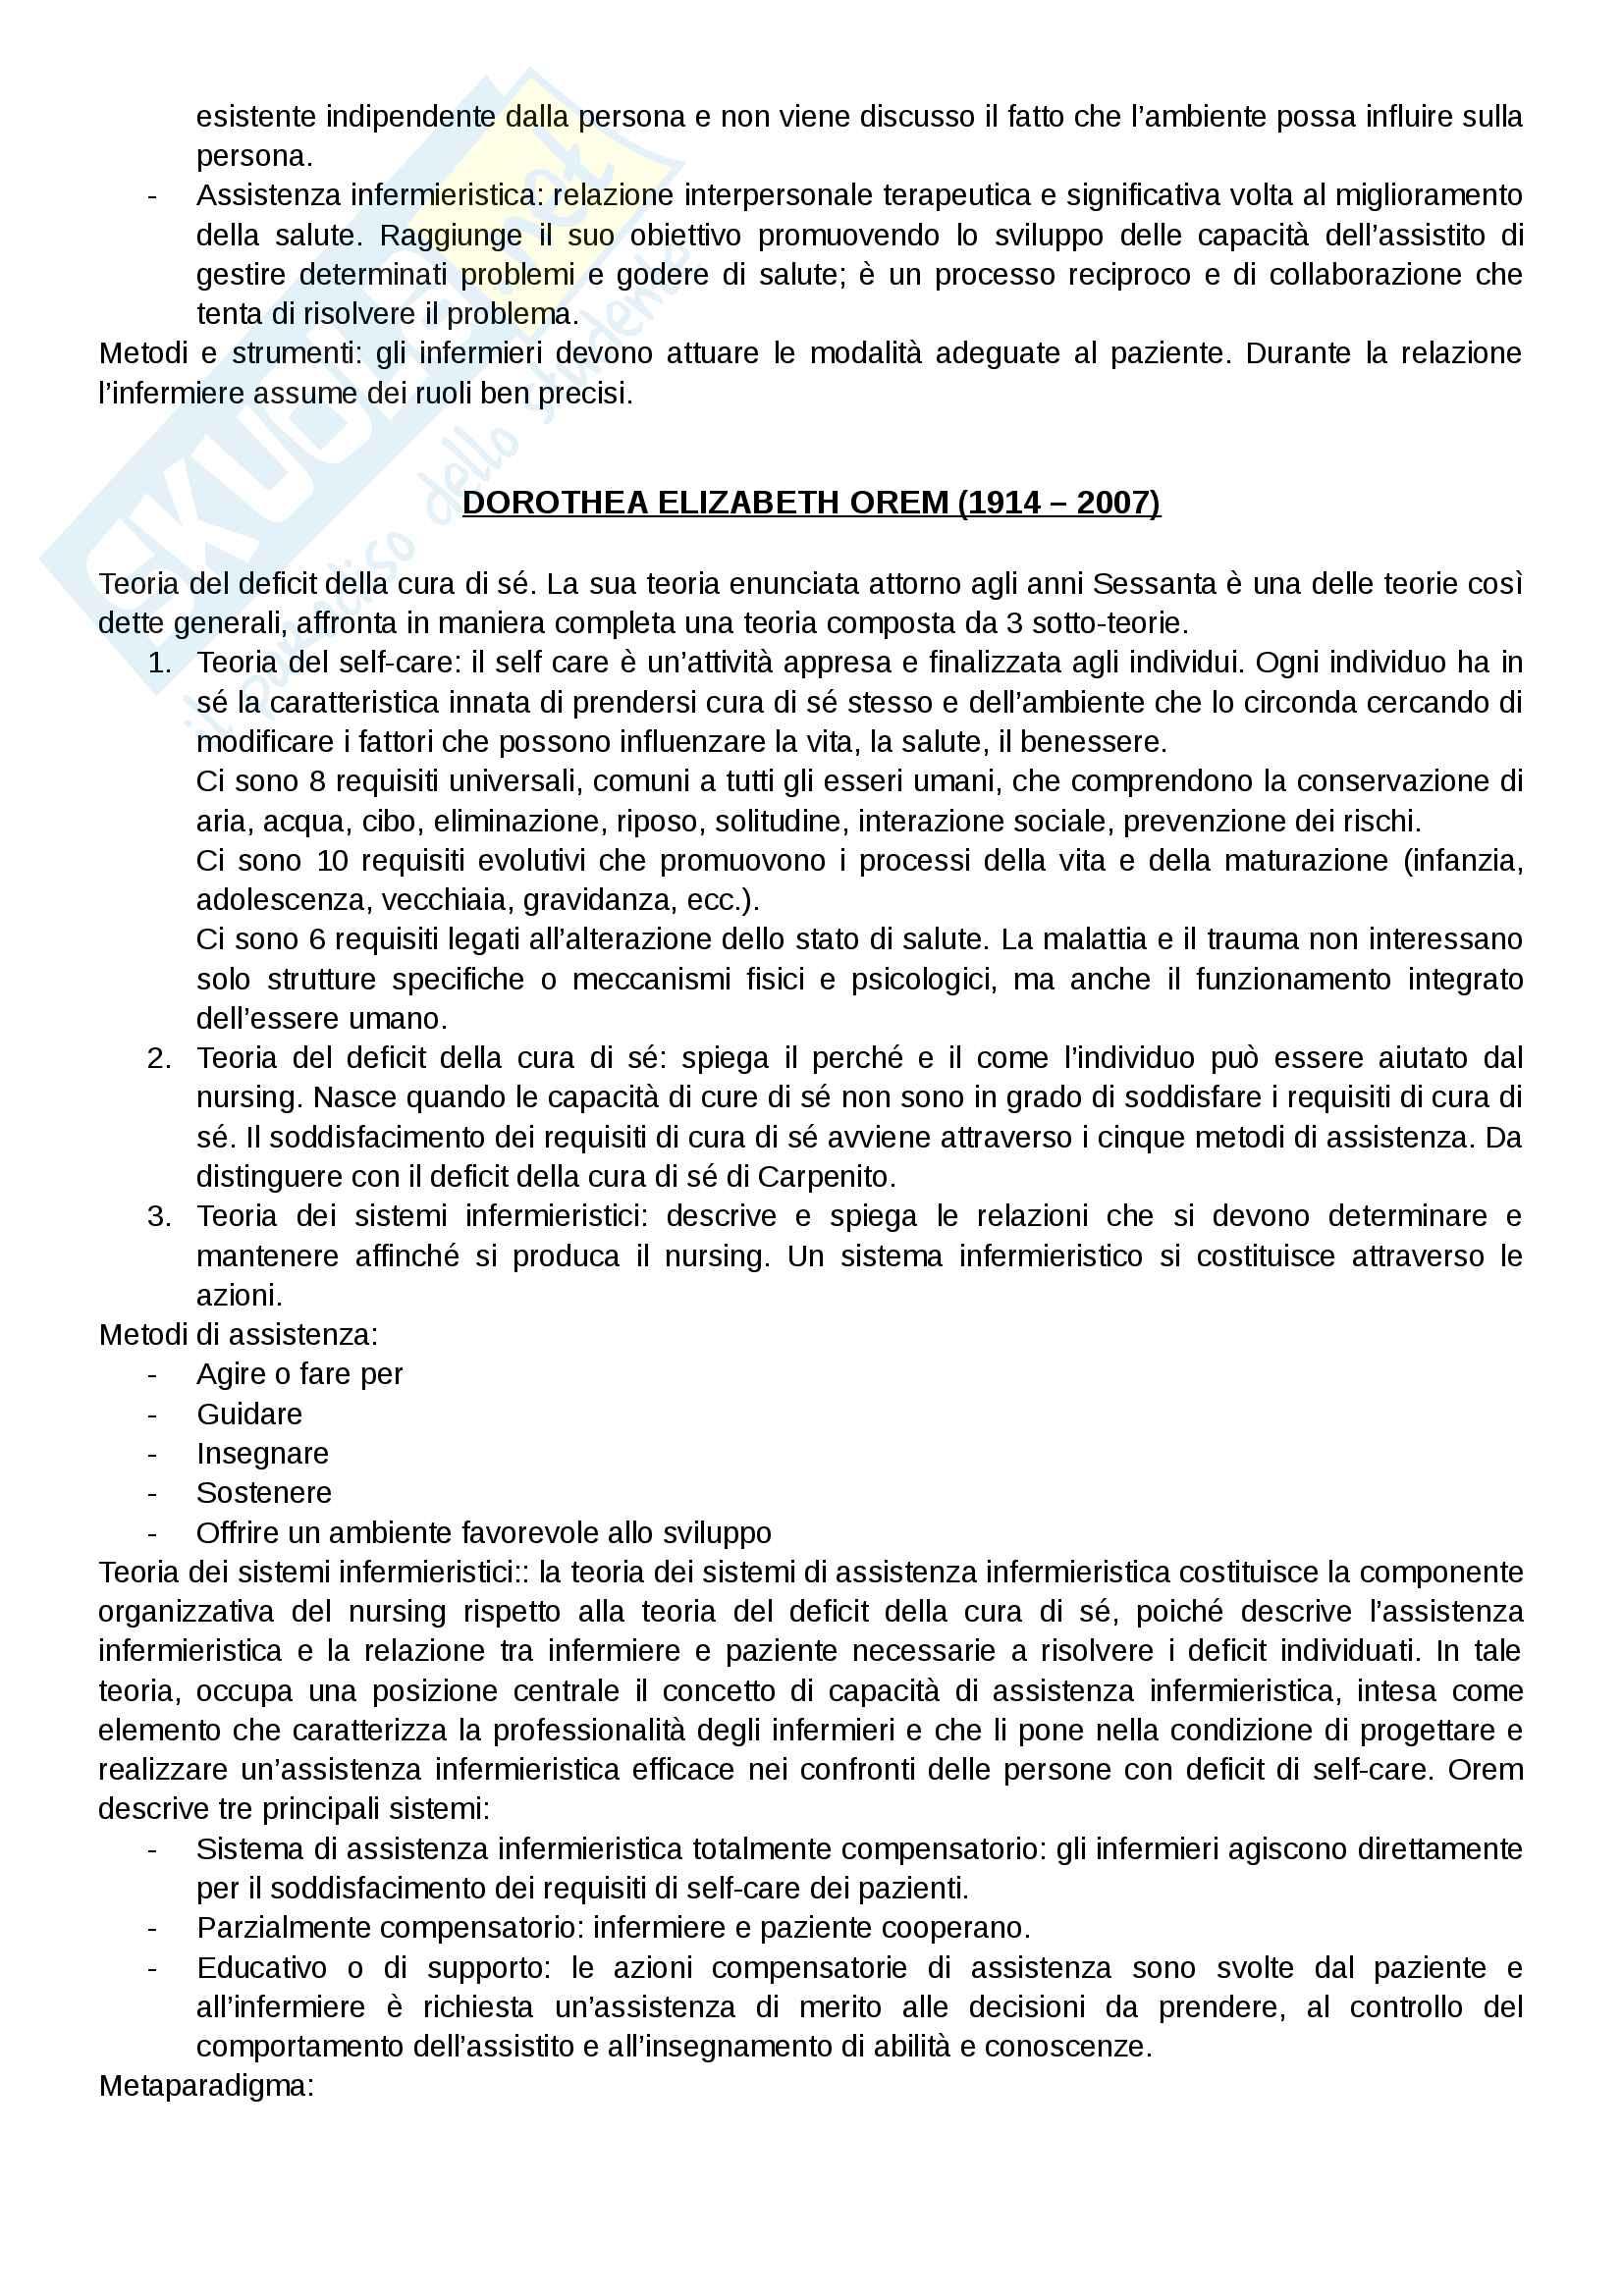 Infermieristica generale Pag. 6